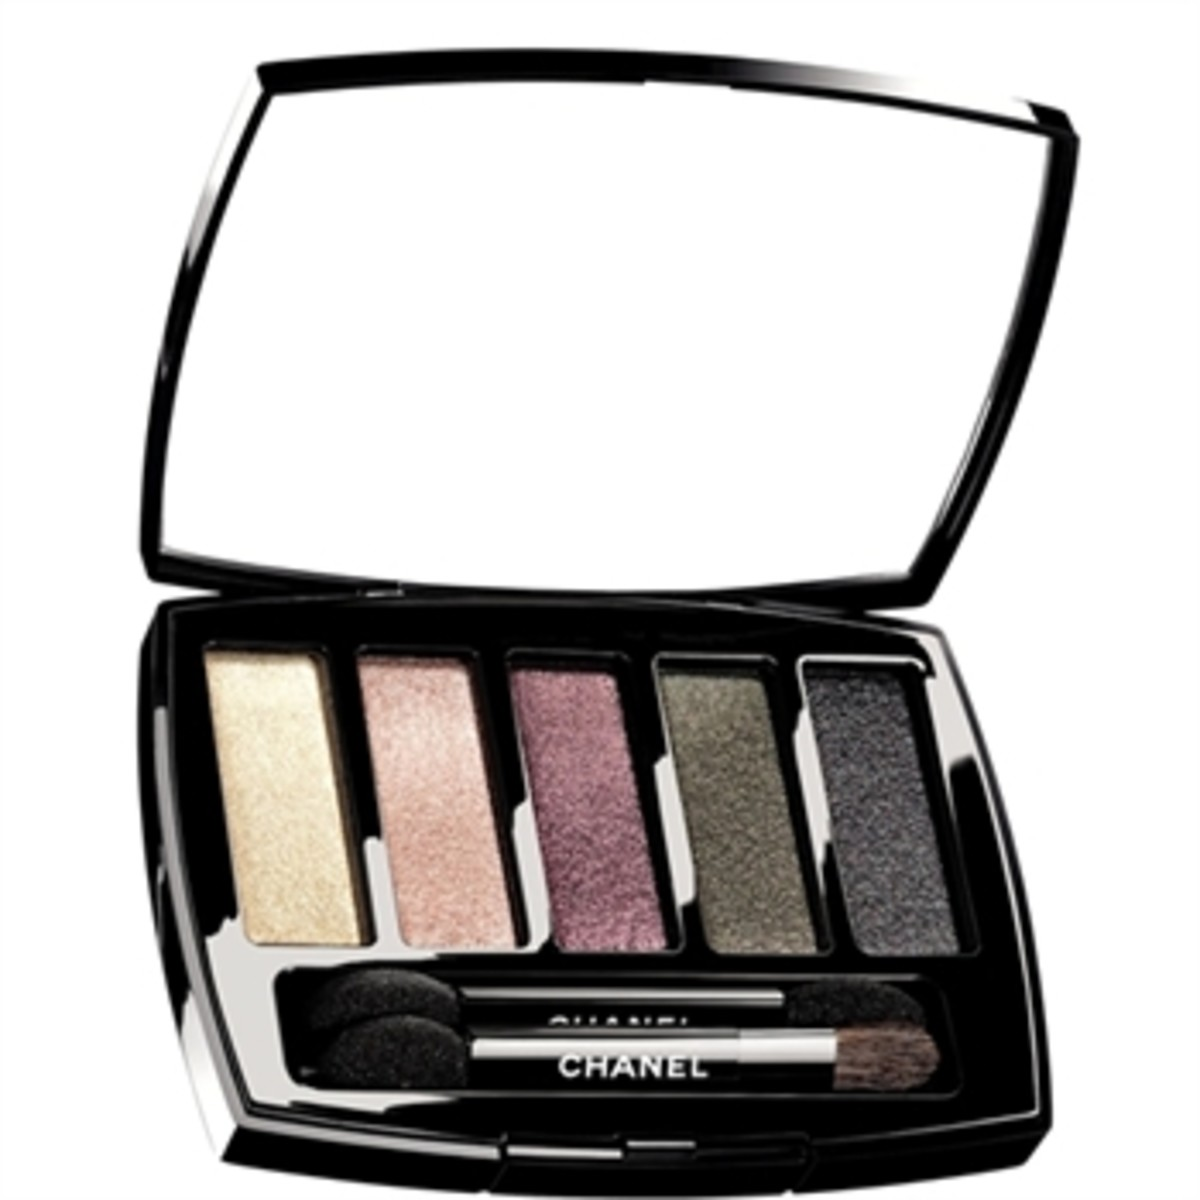 Chanel-Ombres-Perlees-de-Chanel-eyeshadow-palette